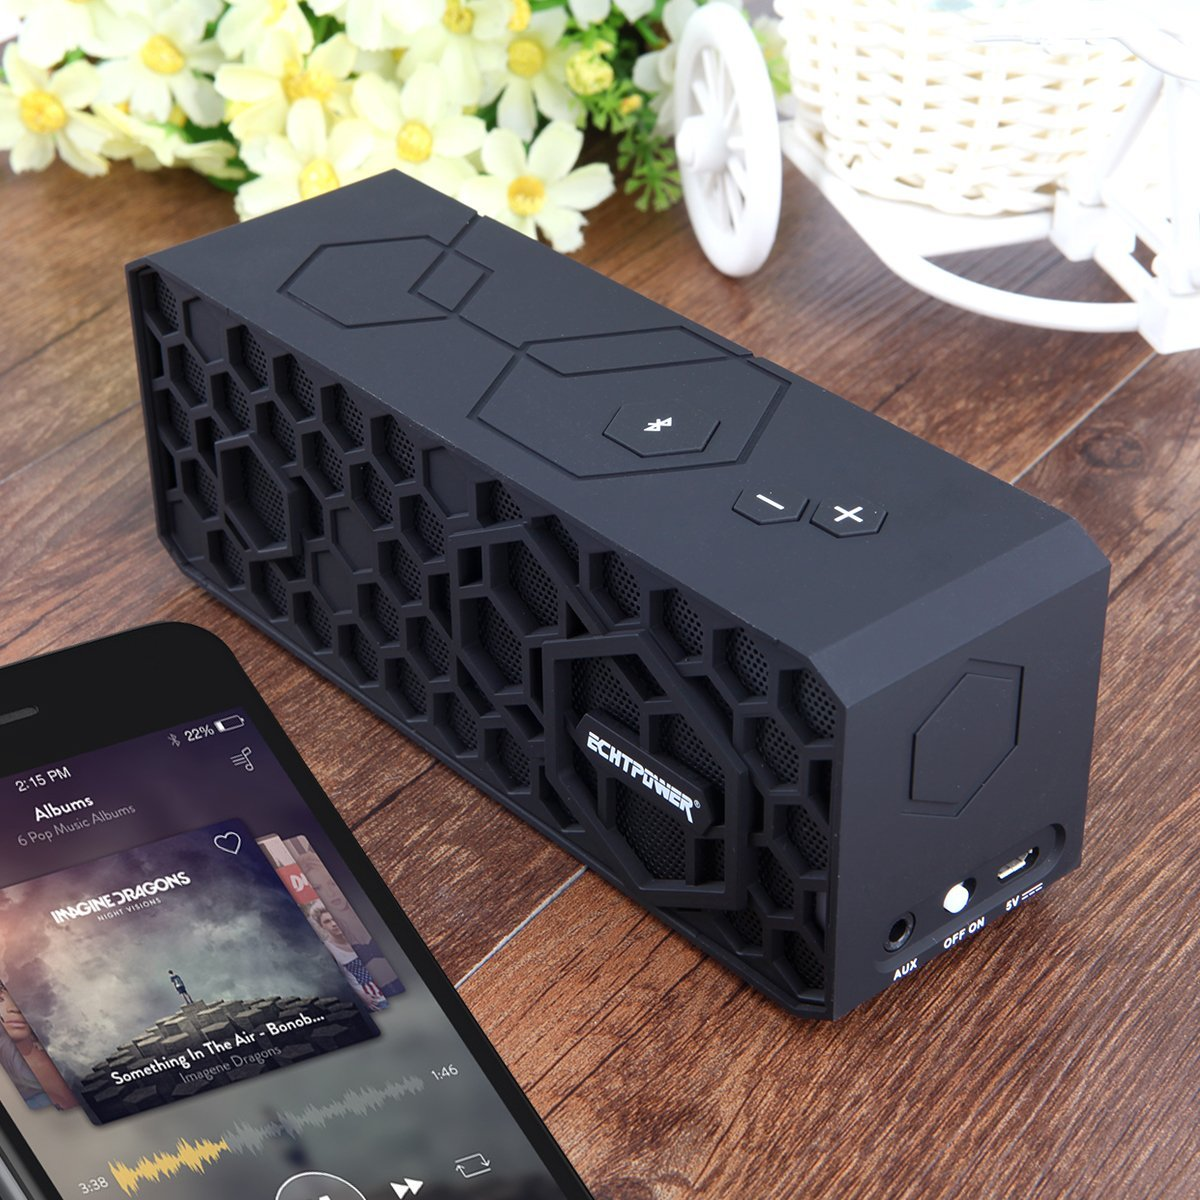 echtpower honeybox stereo high end tragbarer hi fi. Black Bedroom Furniture Sets. Home Design Ideas